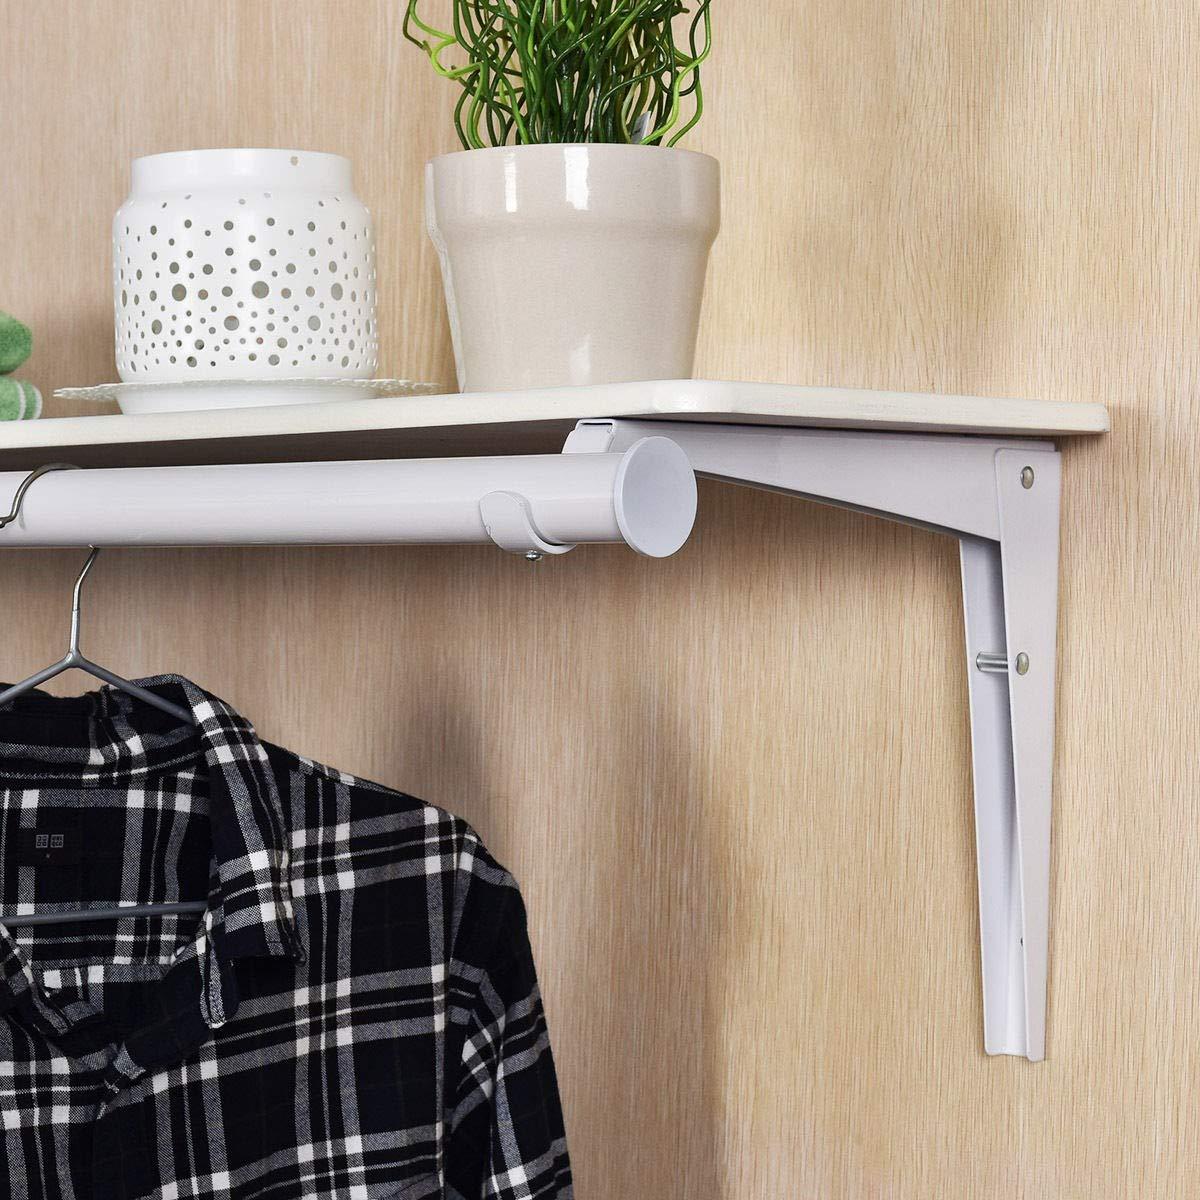 Wall Mount Folding Storage Shelf Utility Rack Holder Home Organizer Hanger